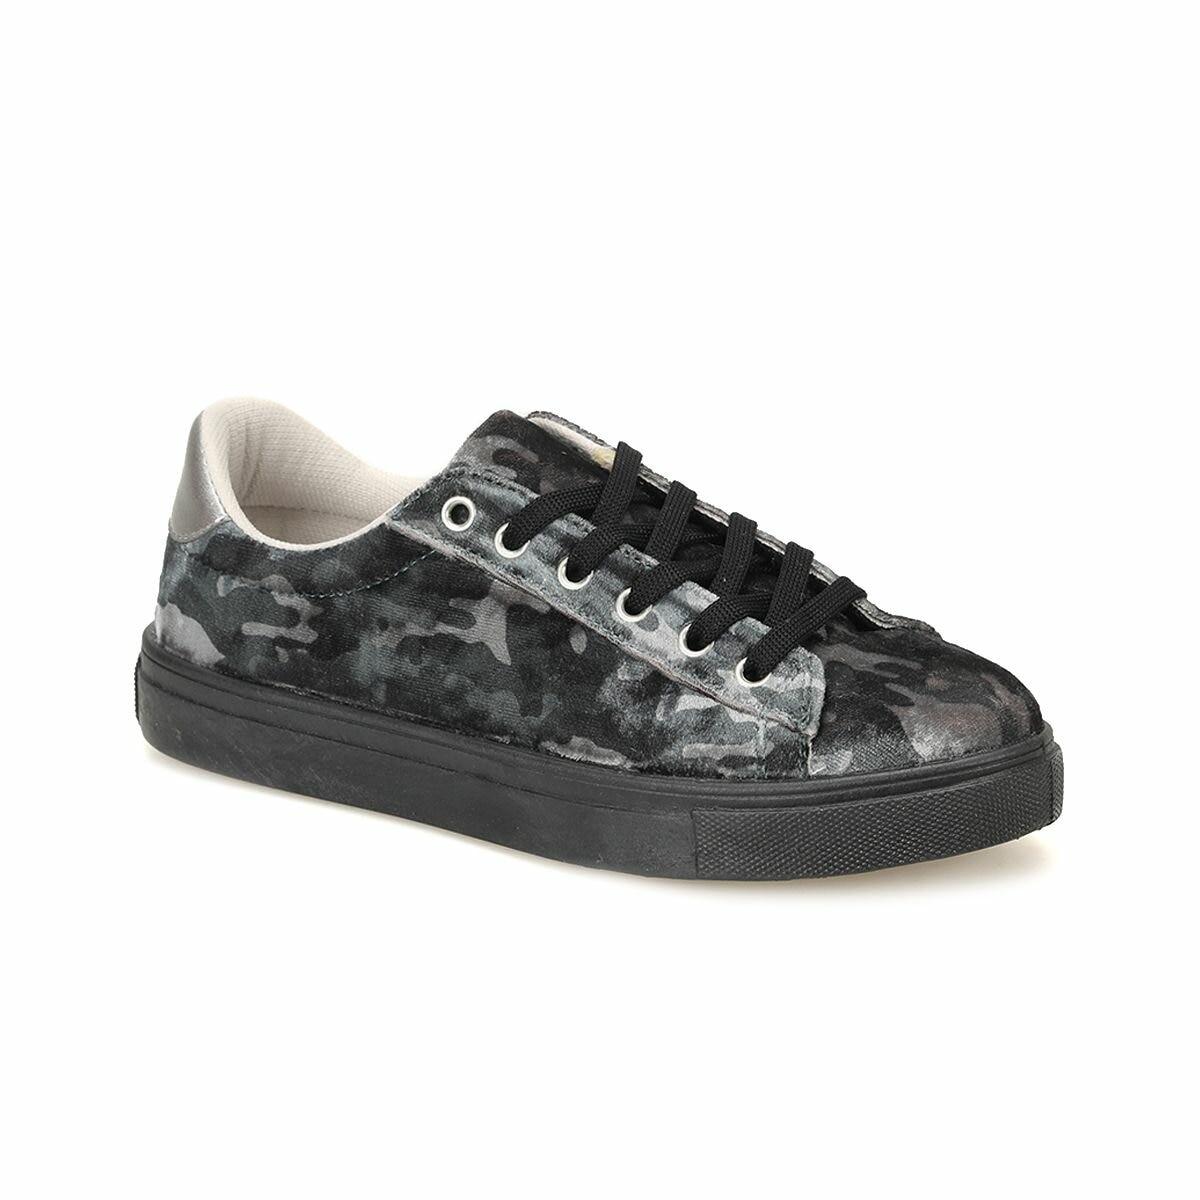 FLO CW18085 Camouflage Color Women 'S Sneaker Shoes Art Bella